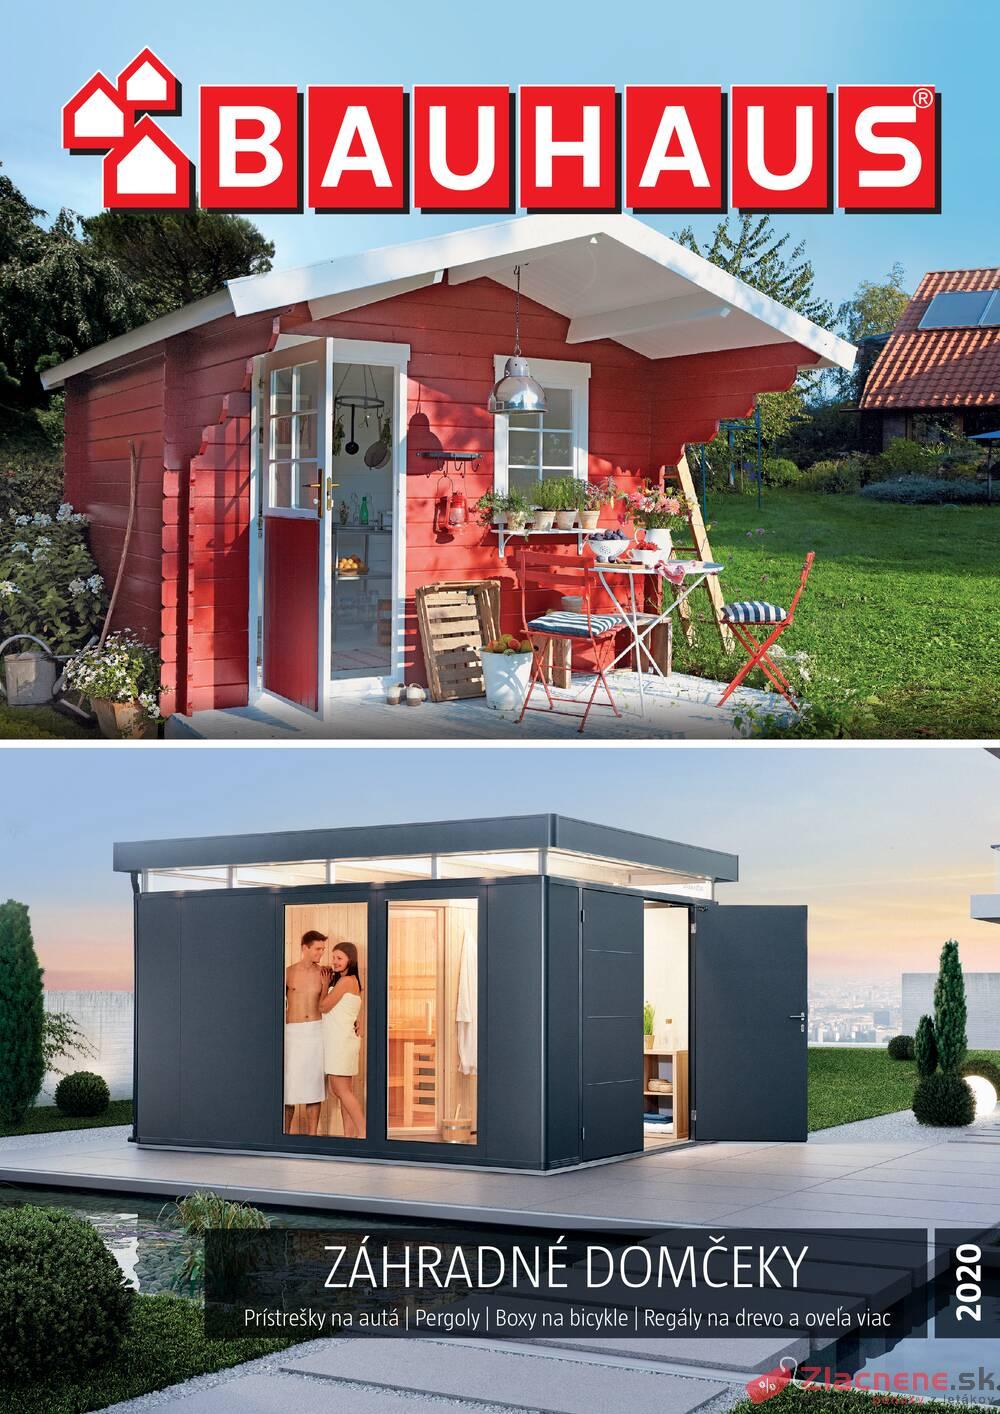 Leták Bauhaus - Bauhaus Zahradné domčeky 28.2. - 31.8. - strana 1